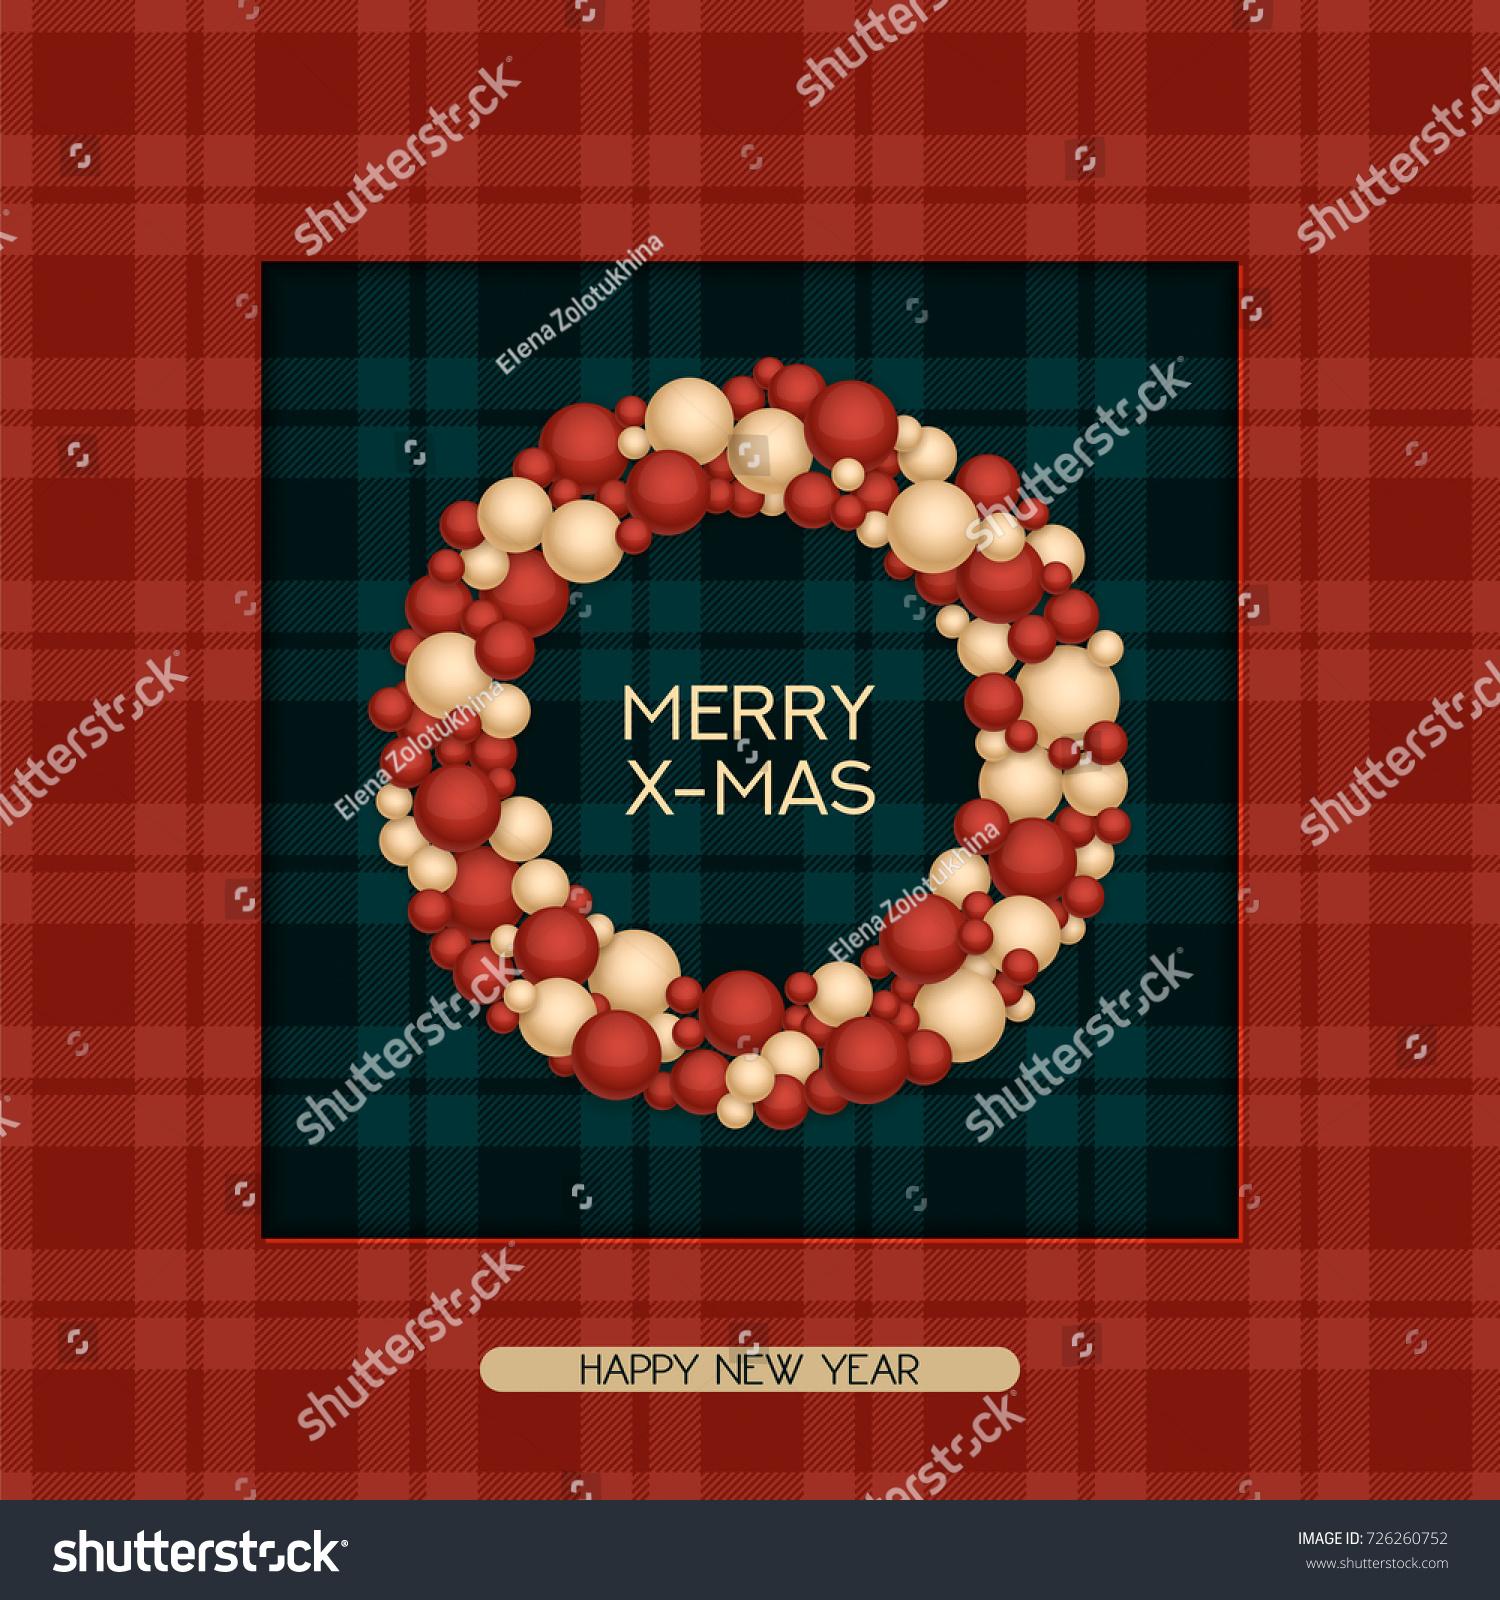 Vector Holiday Christmas Postcard Greeting Words Stock Vector